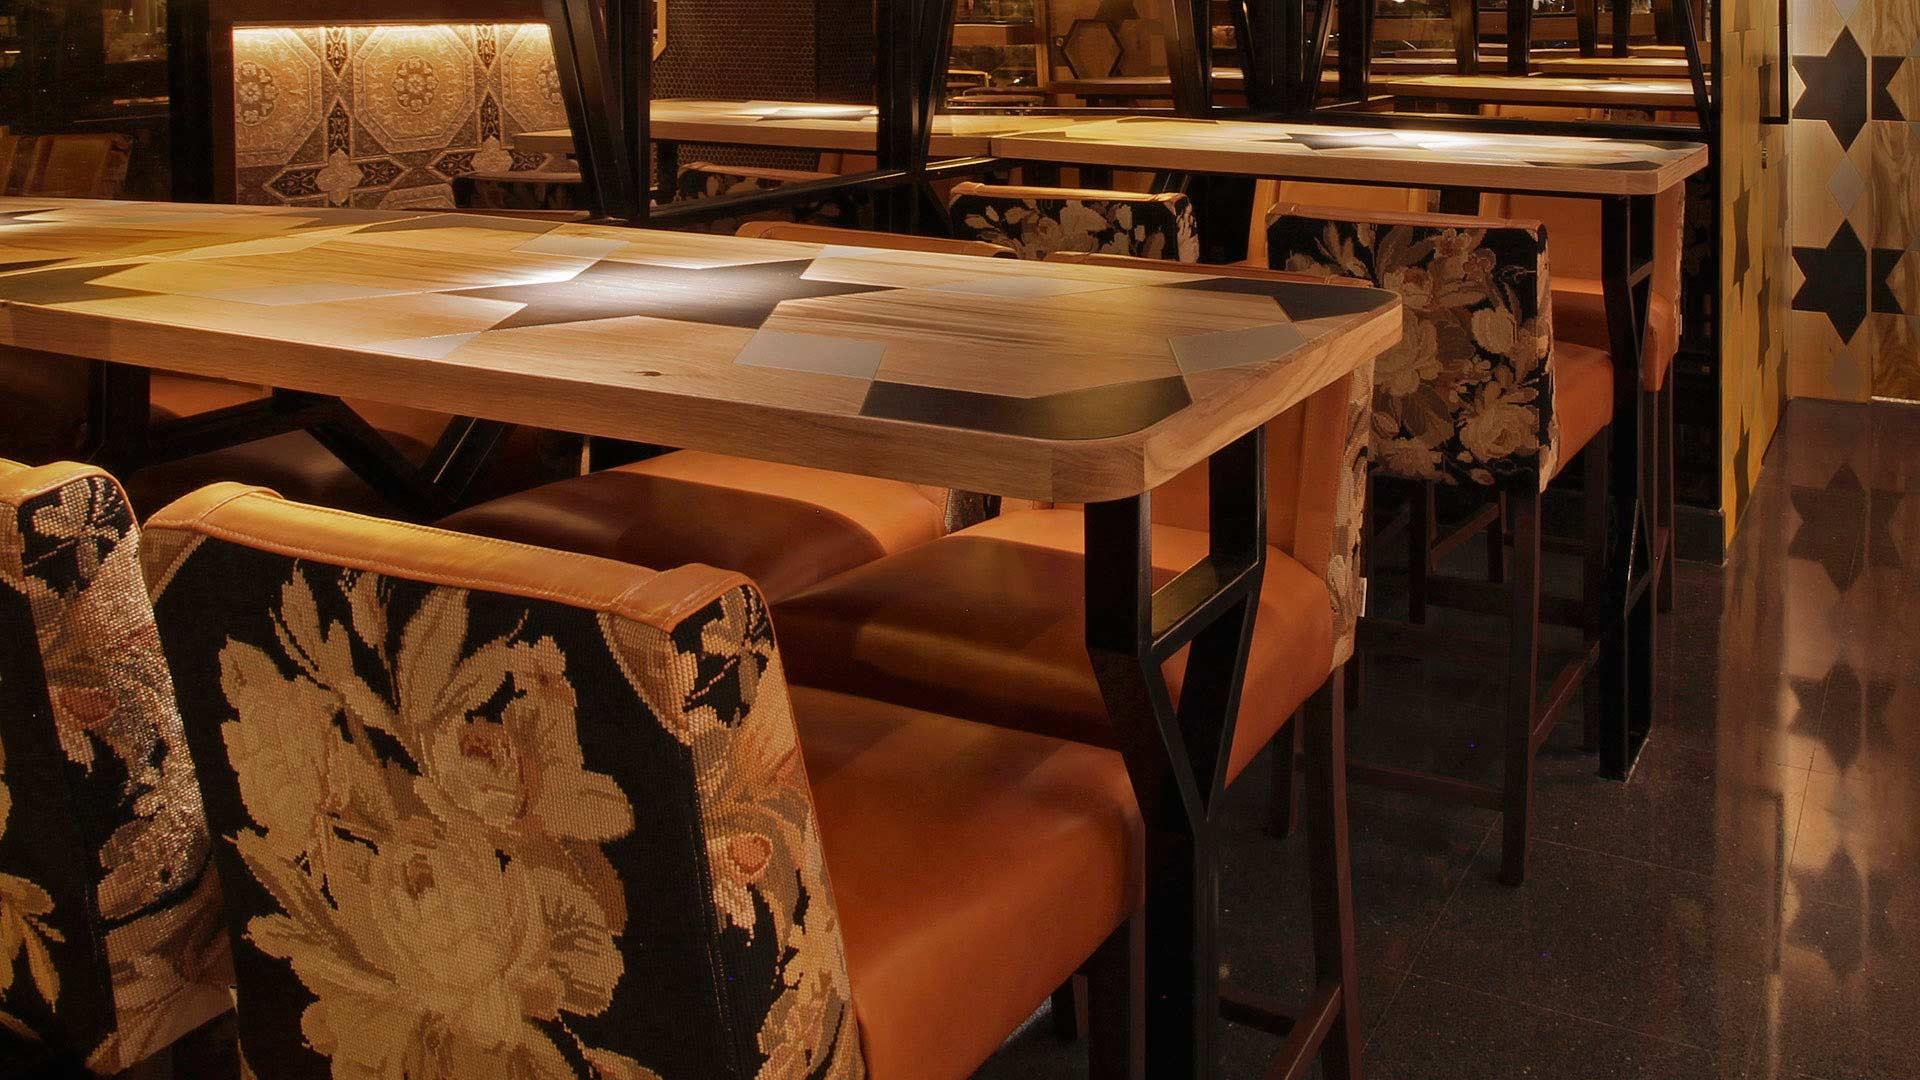 04 detalle mesas tapiceria pershic verno